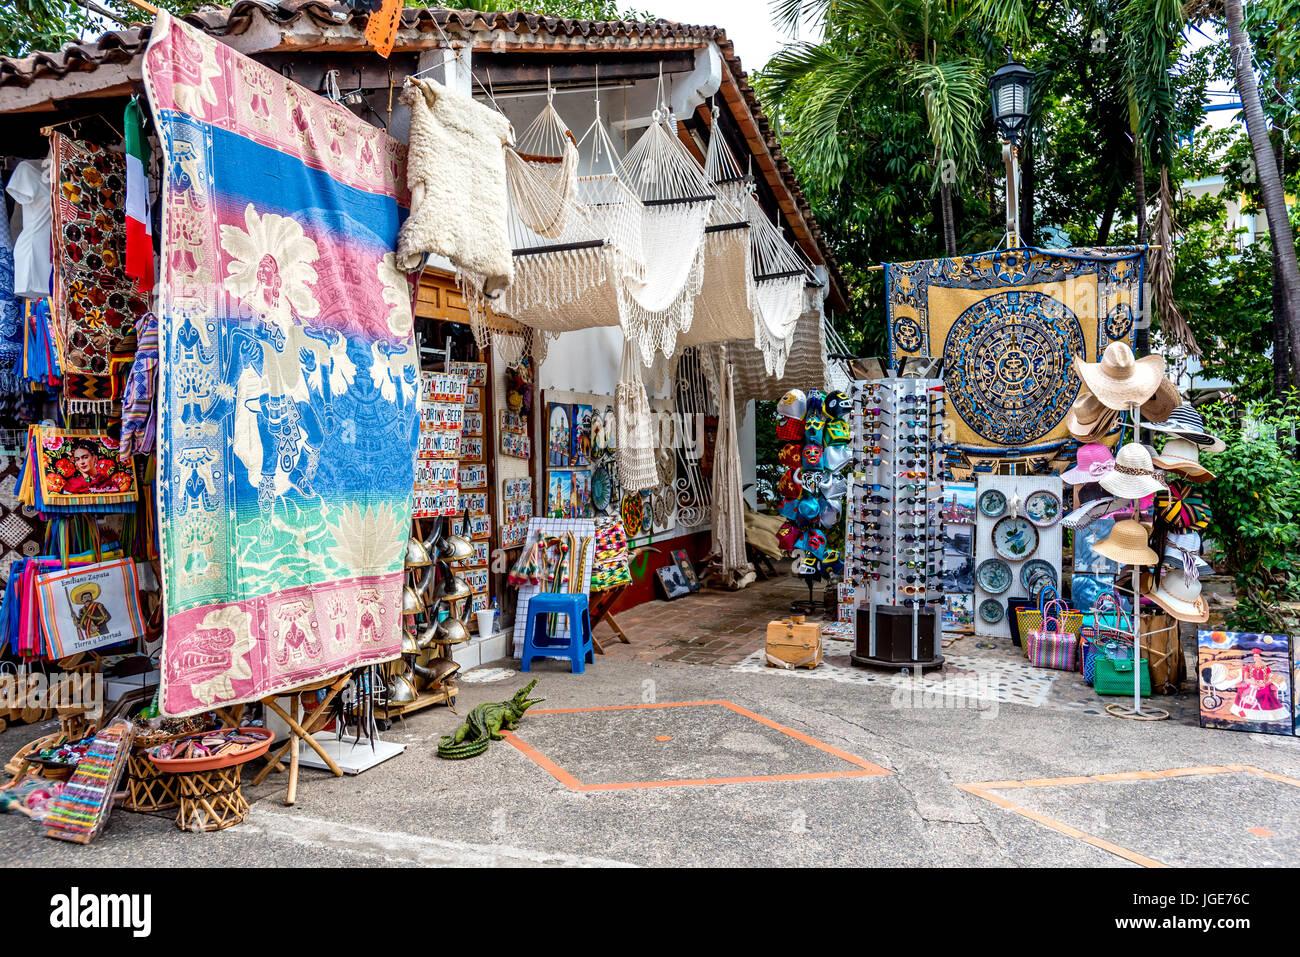 Outdoor market in Puerto Vallarta's Zona Romantica on the Rio Cuale with souvenirs, textiles, hammocks. - Stock Image